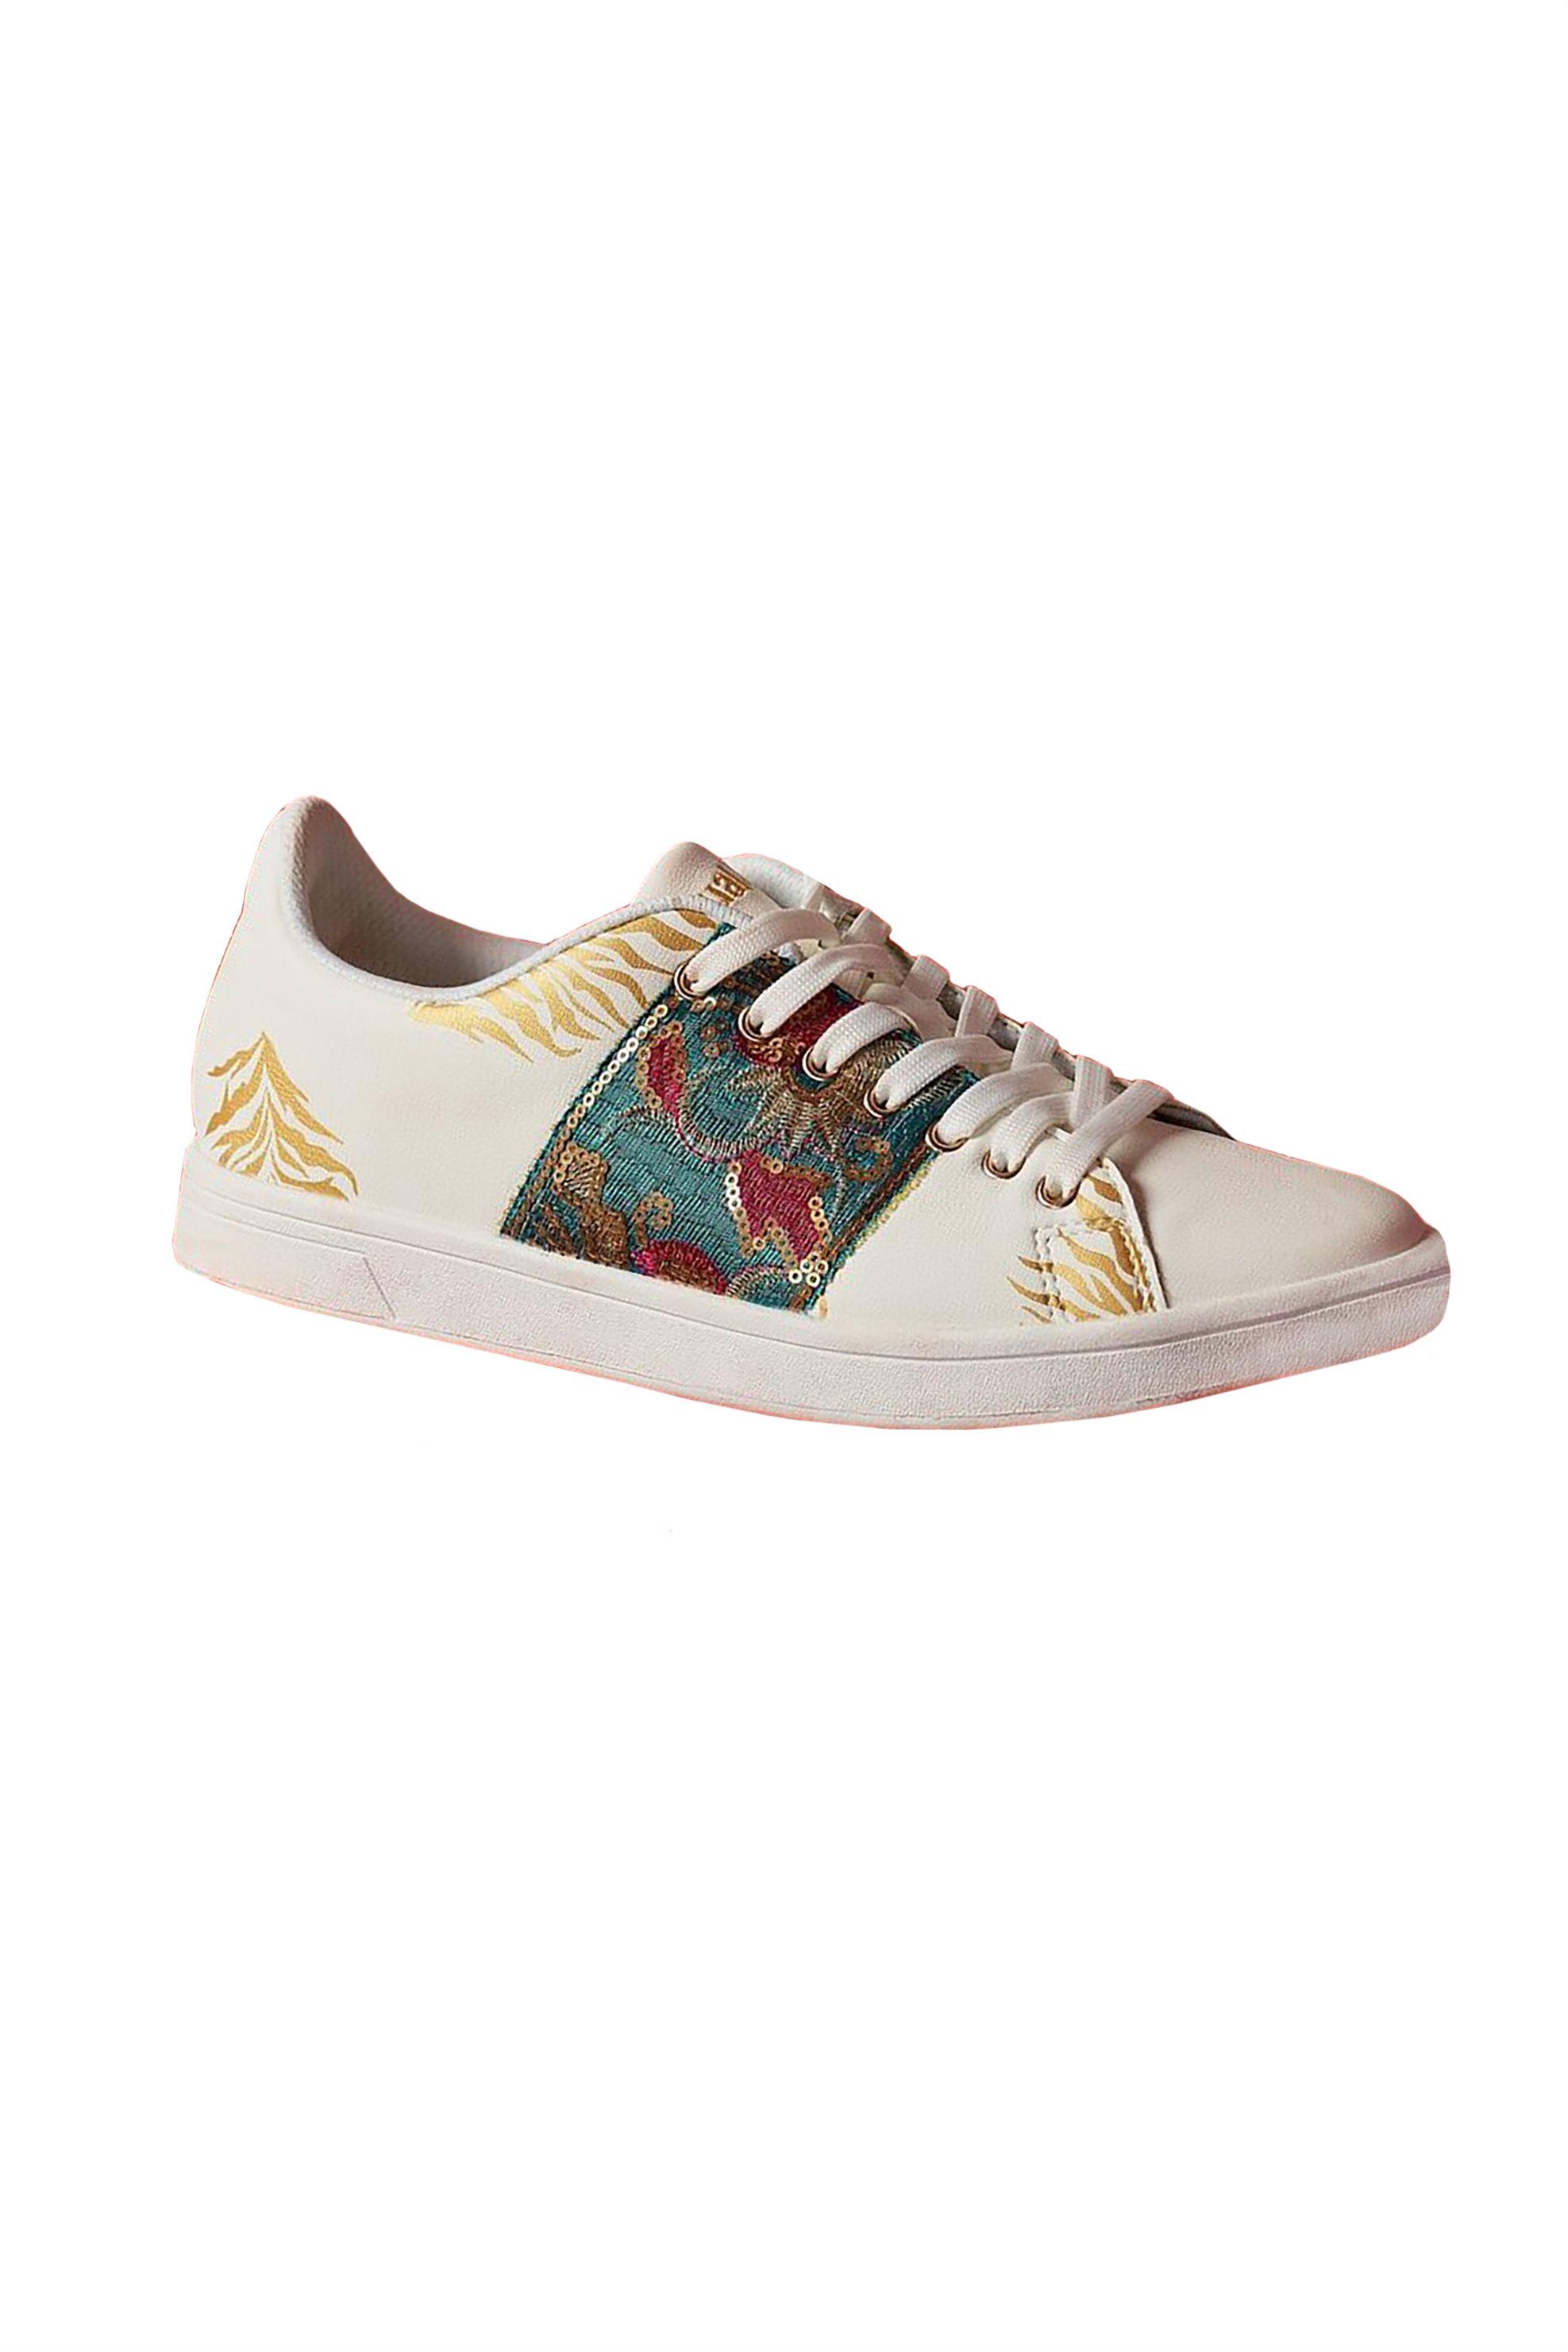 eb4f5203e49 Desigual γυναικεία sneakers Cosmic Exotic Tropical - 19SSKP11 - Λευκό